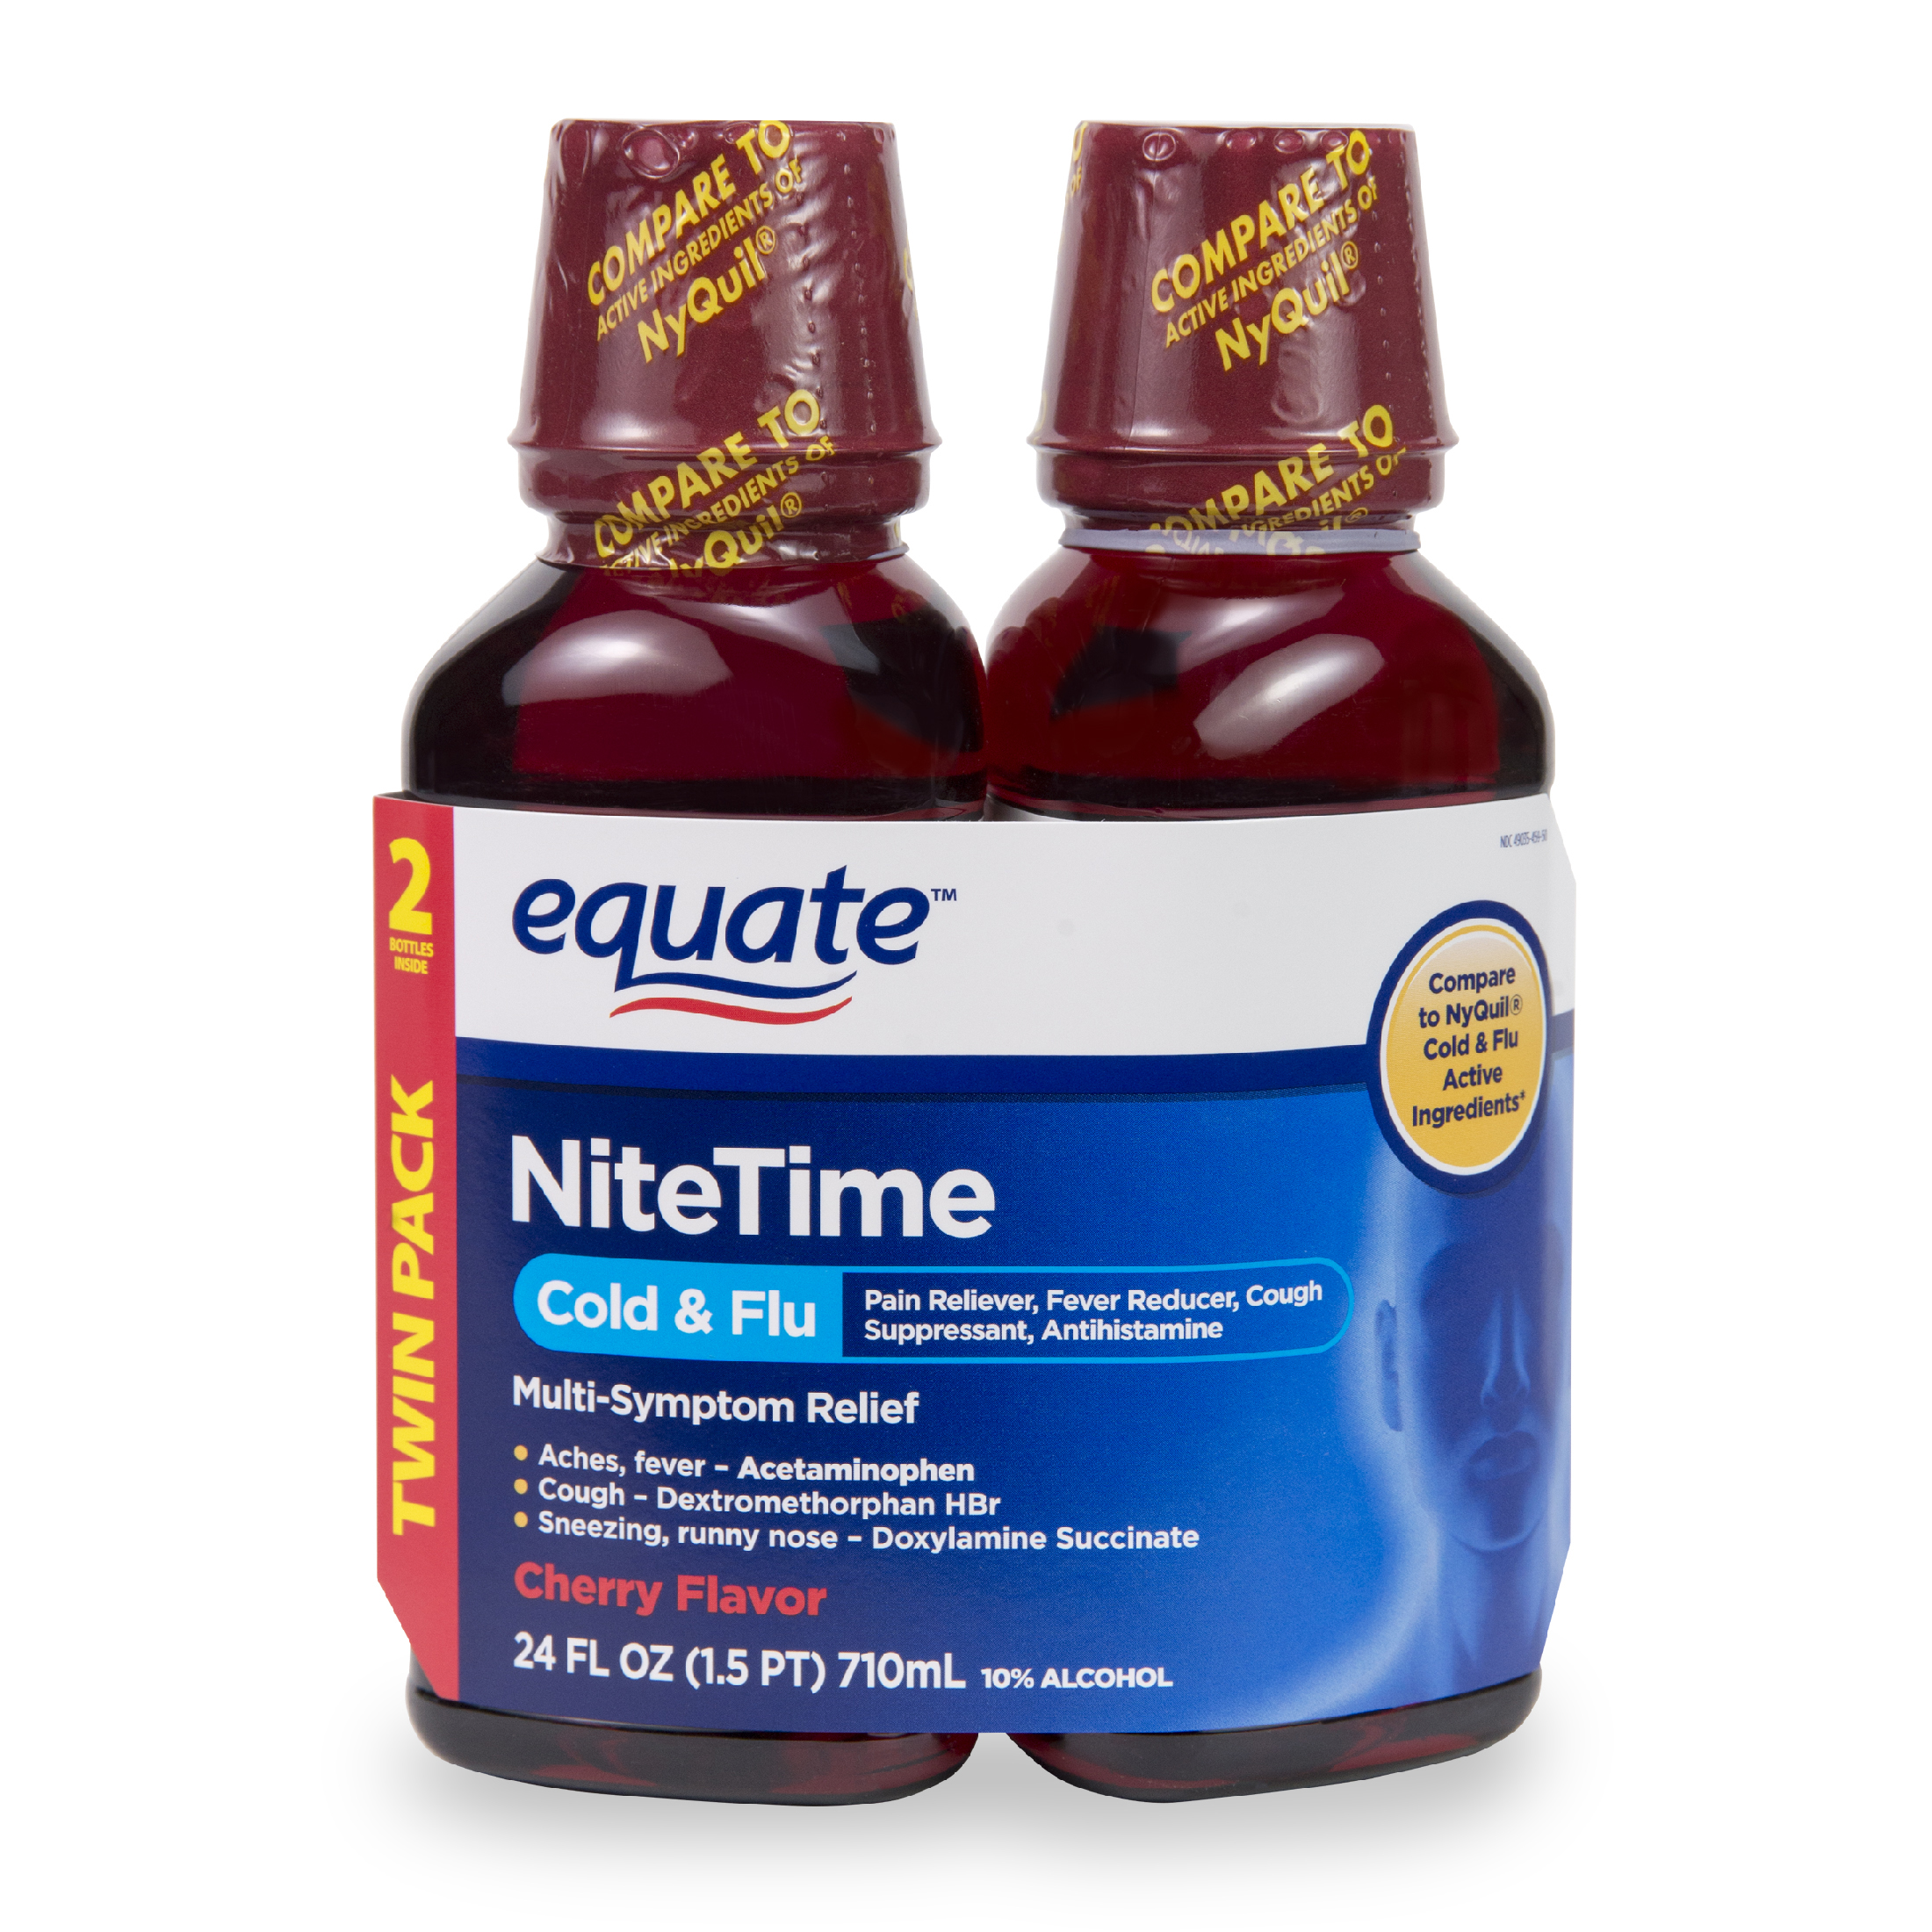 Equate Nitetime Cold & Flu Relief Liquid, Cherry, 12 Oz, 2 Pk